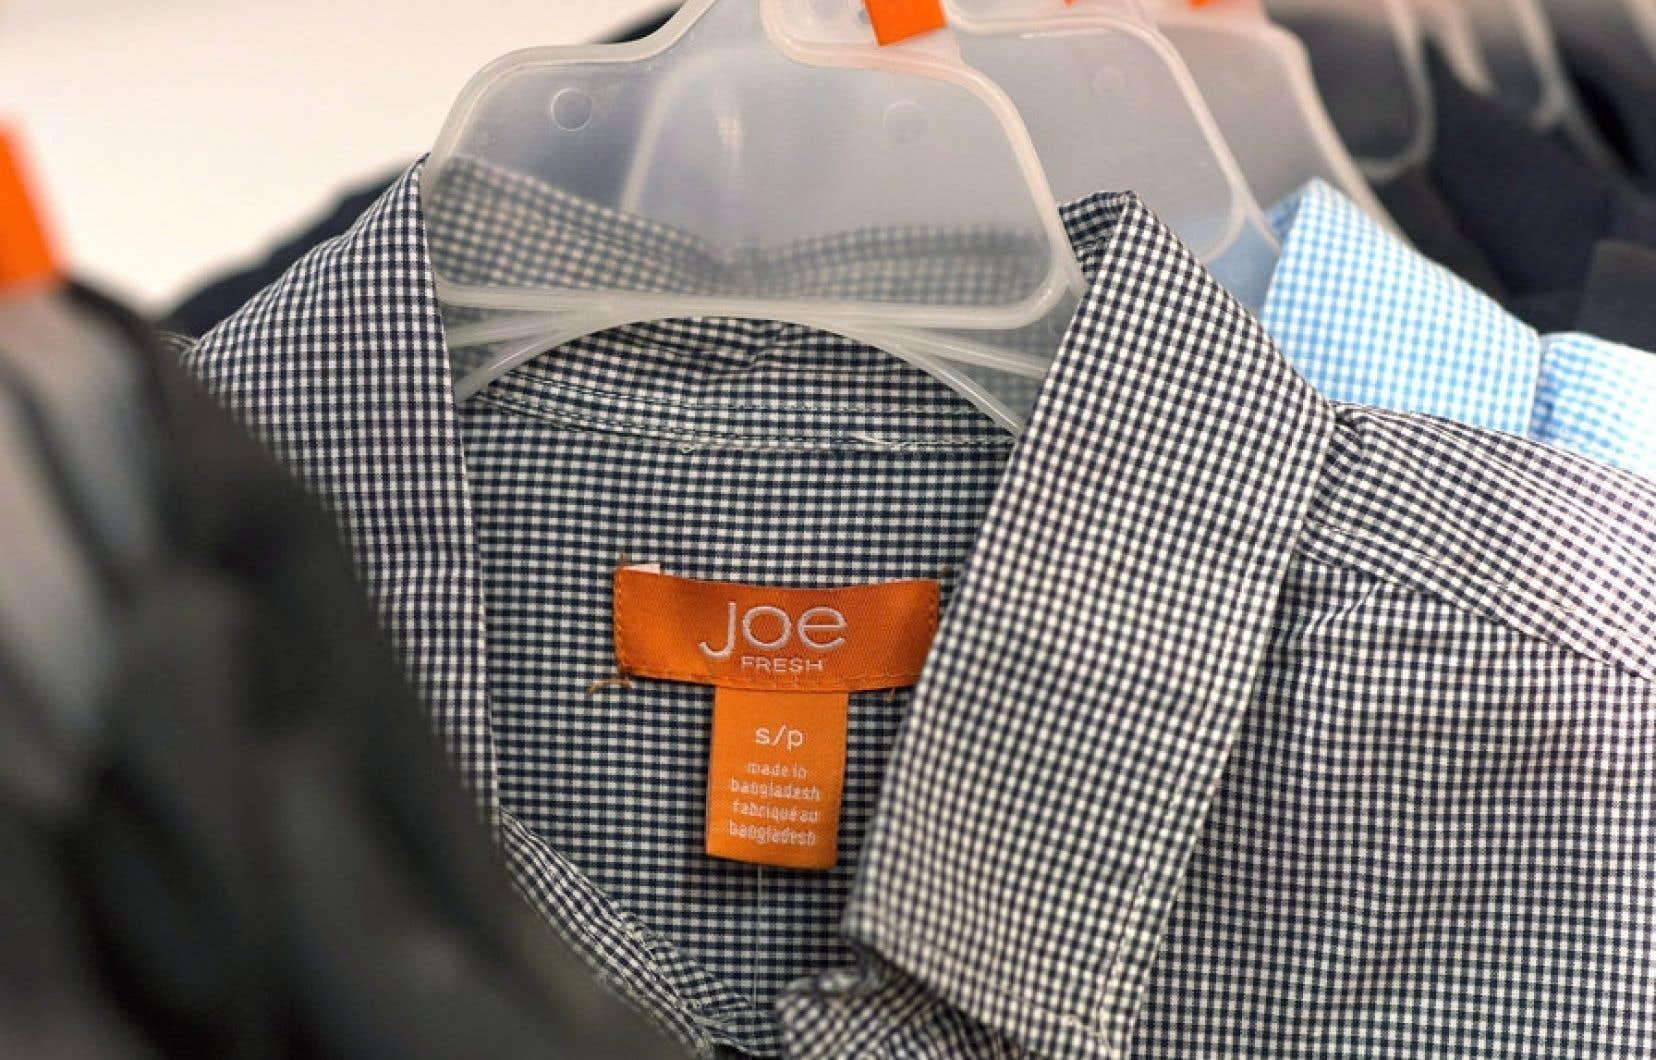 La ligne de vêtements Joe Fresh, de la compagnie Loblaw.